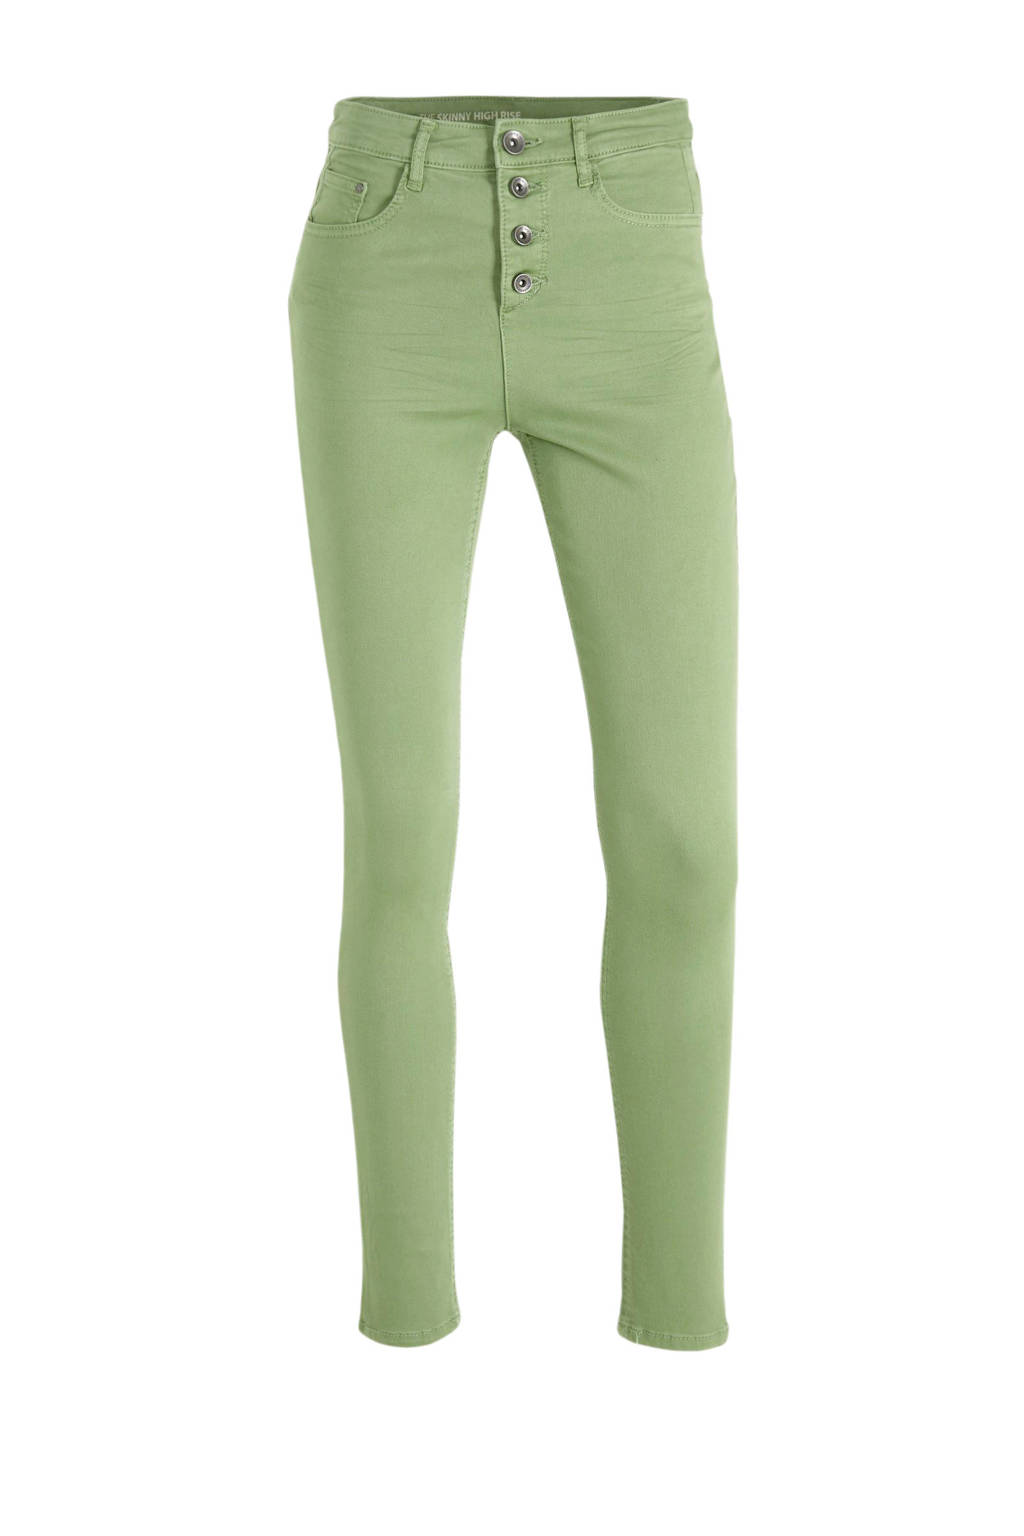 C&A Yessica high waist skinny jeans groen, Groen